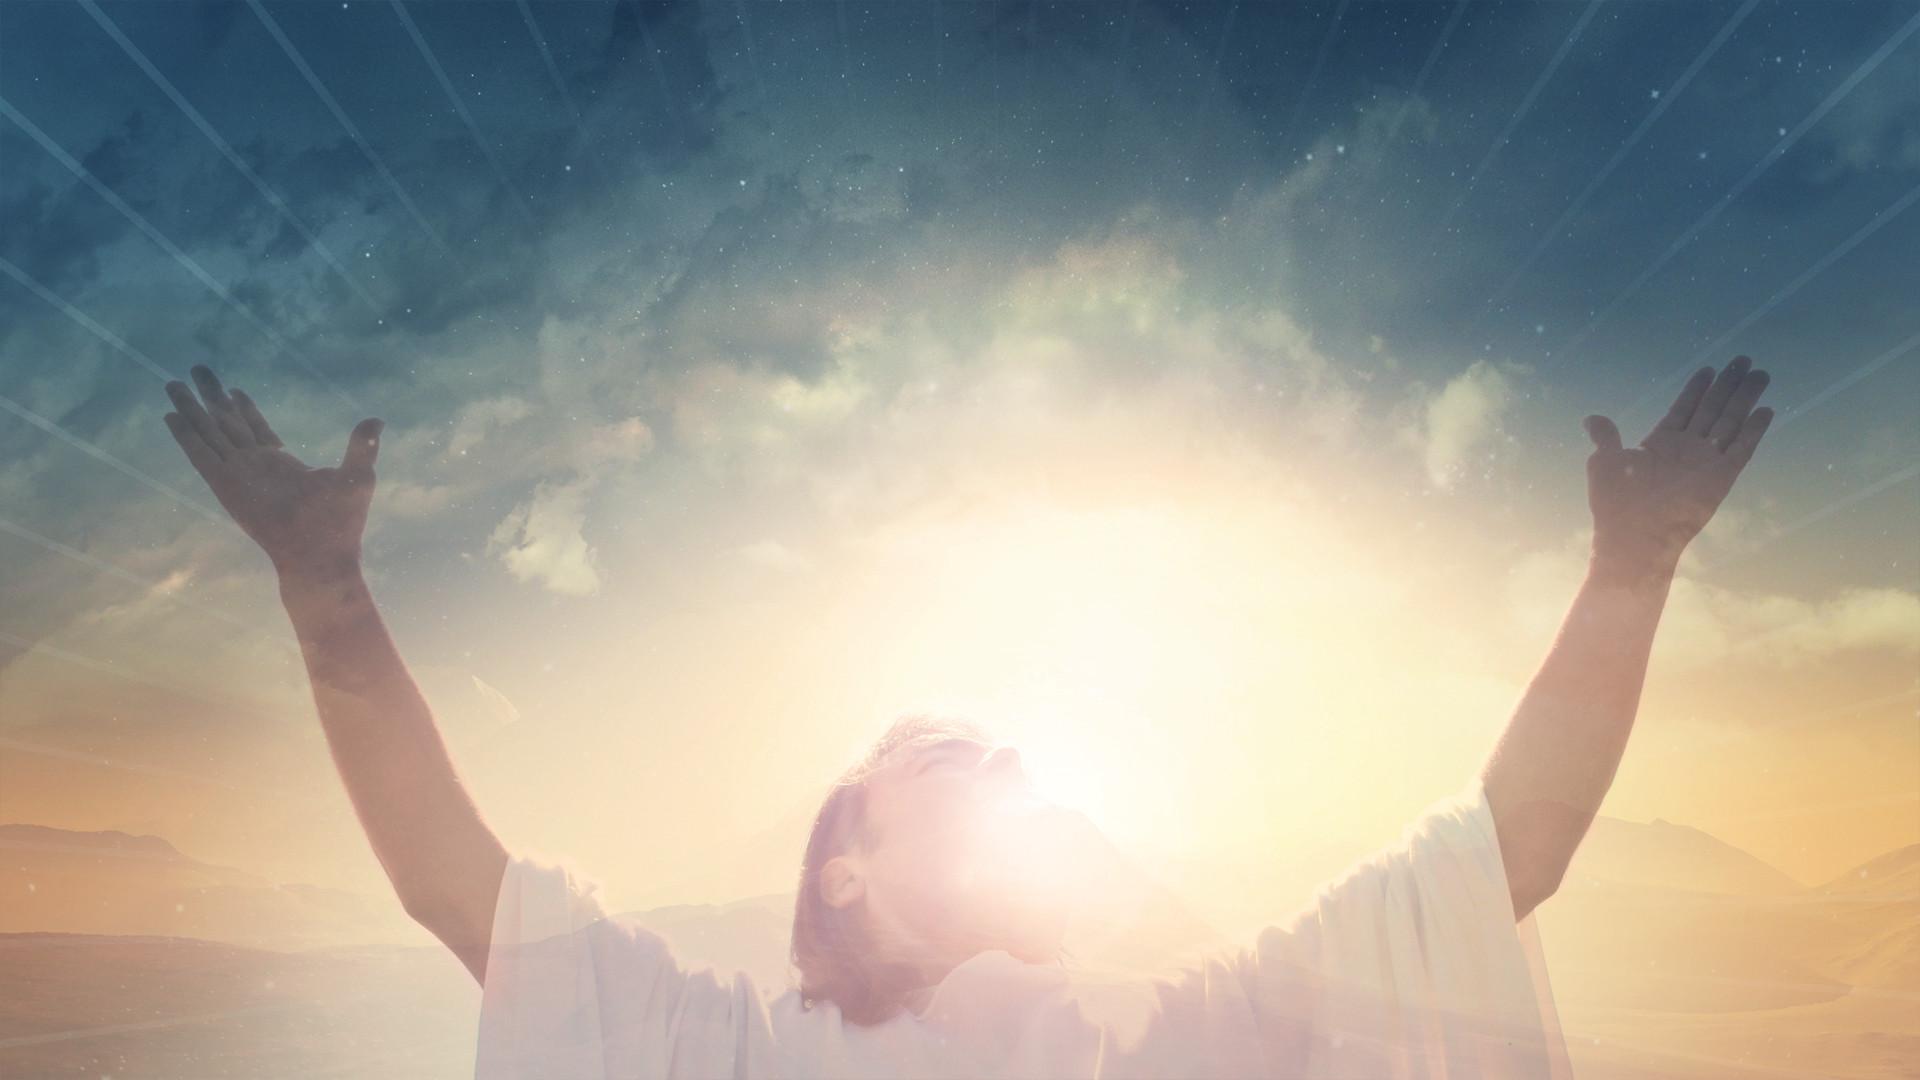 … Jesus Risen Savior Christian Wallpaper …